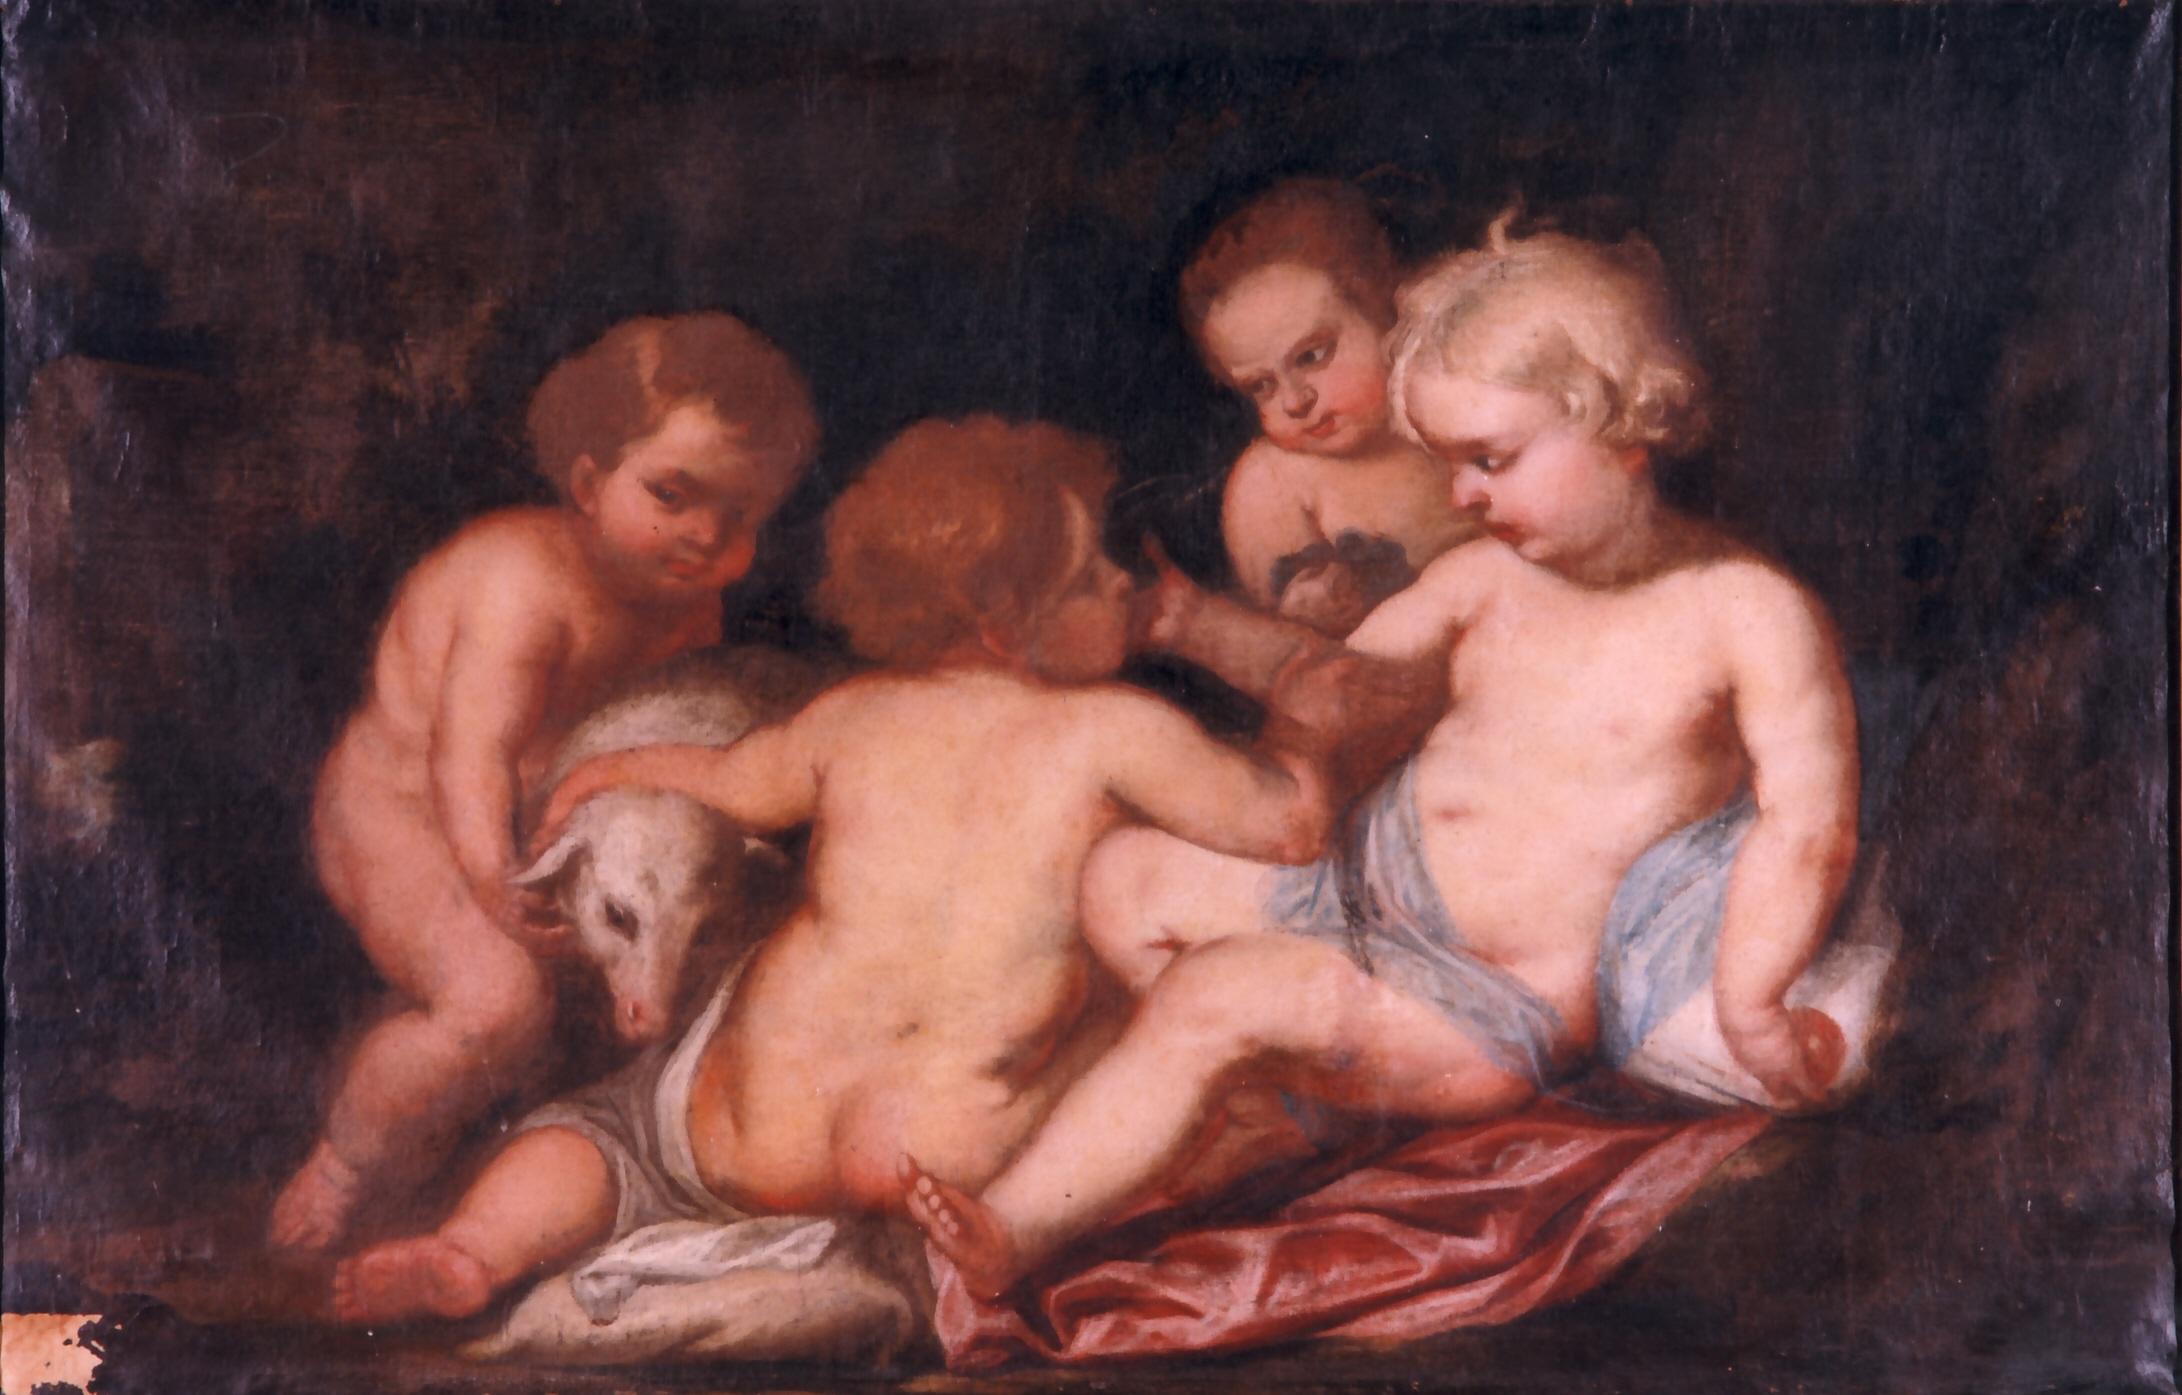 File:Antolinezbacanal con niños.jpg  Wikimedia Commons